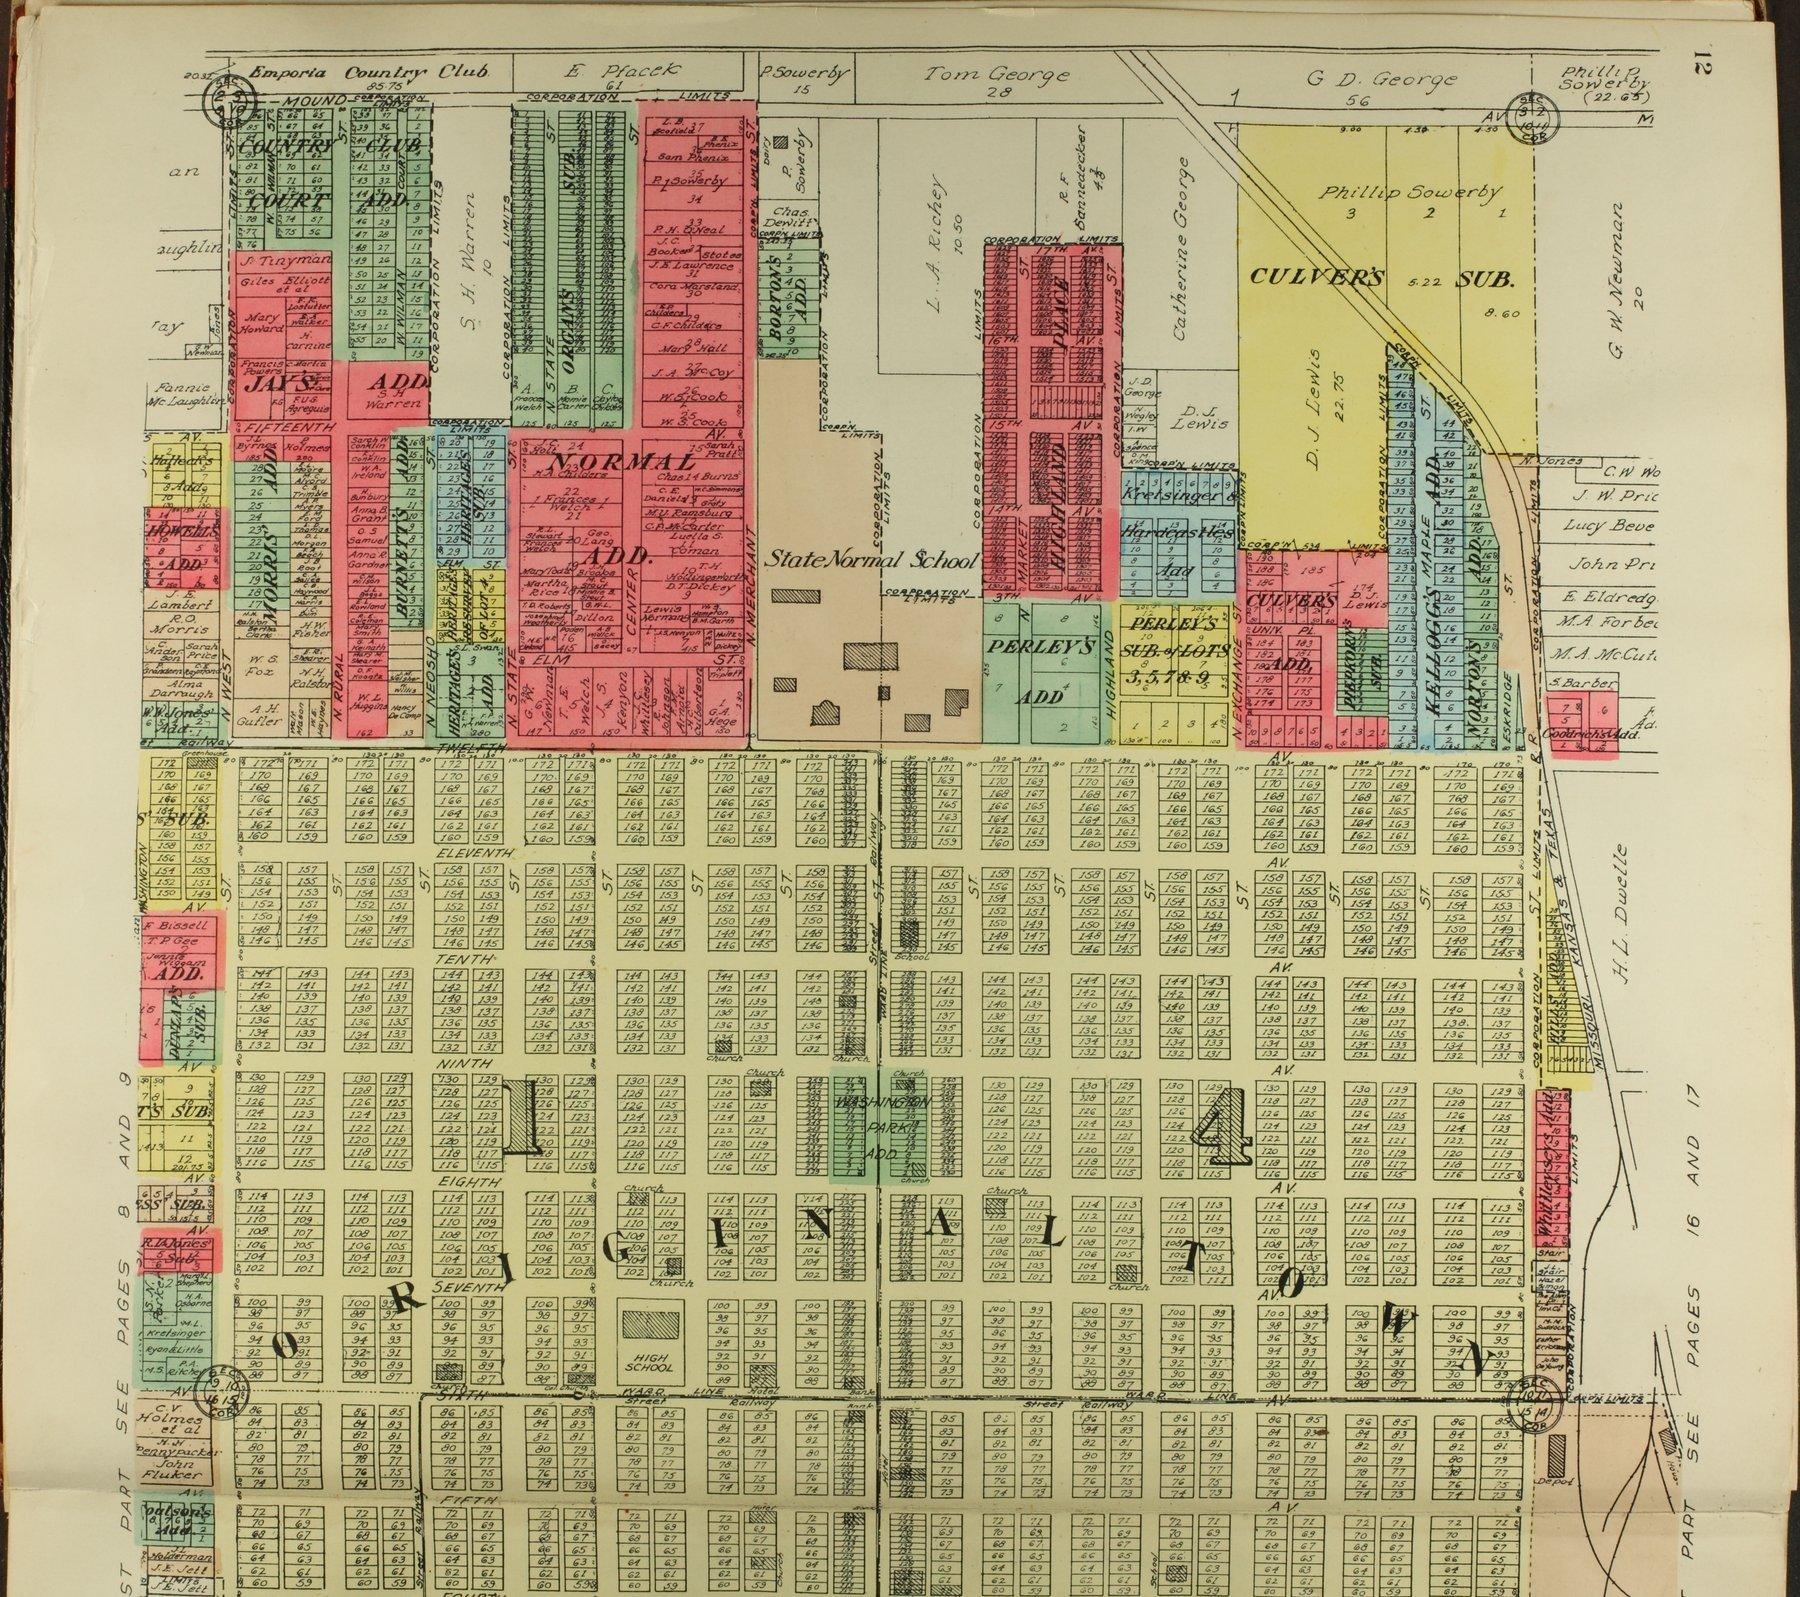 Standard atlas of Lyon County, Kansas - 12